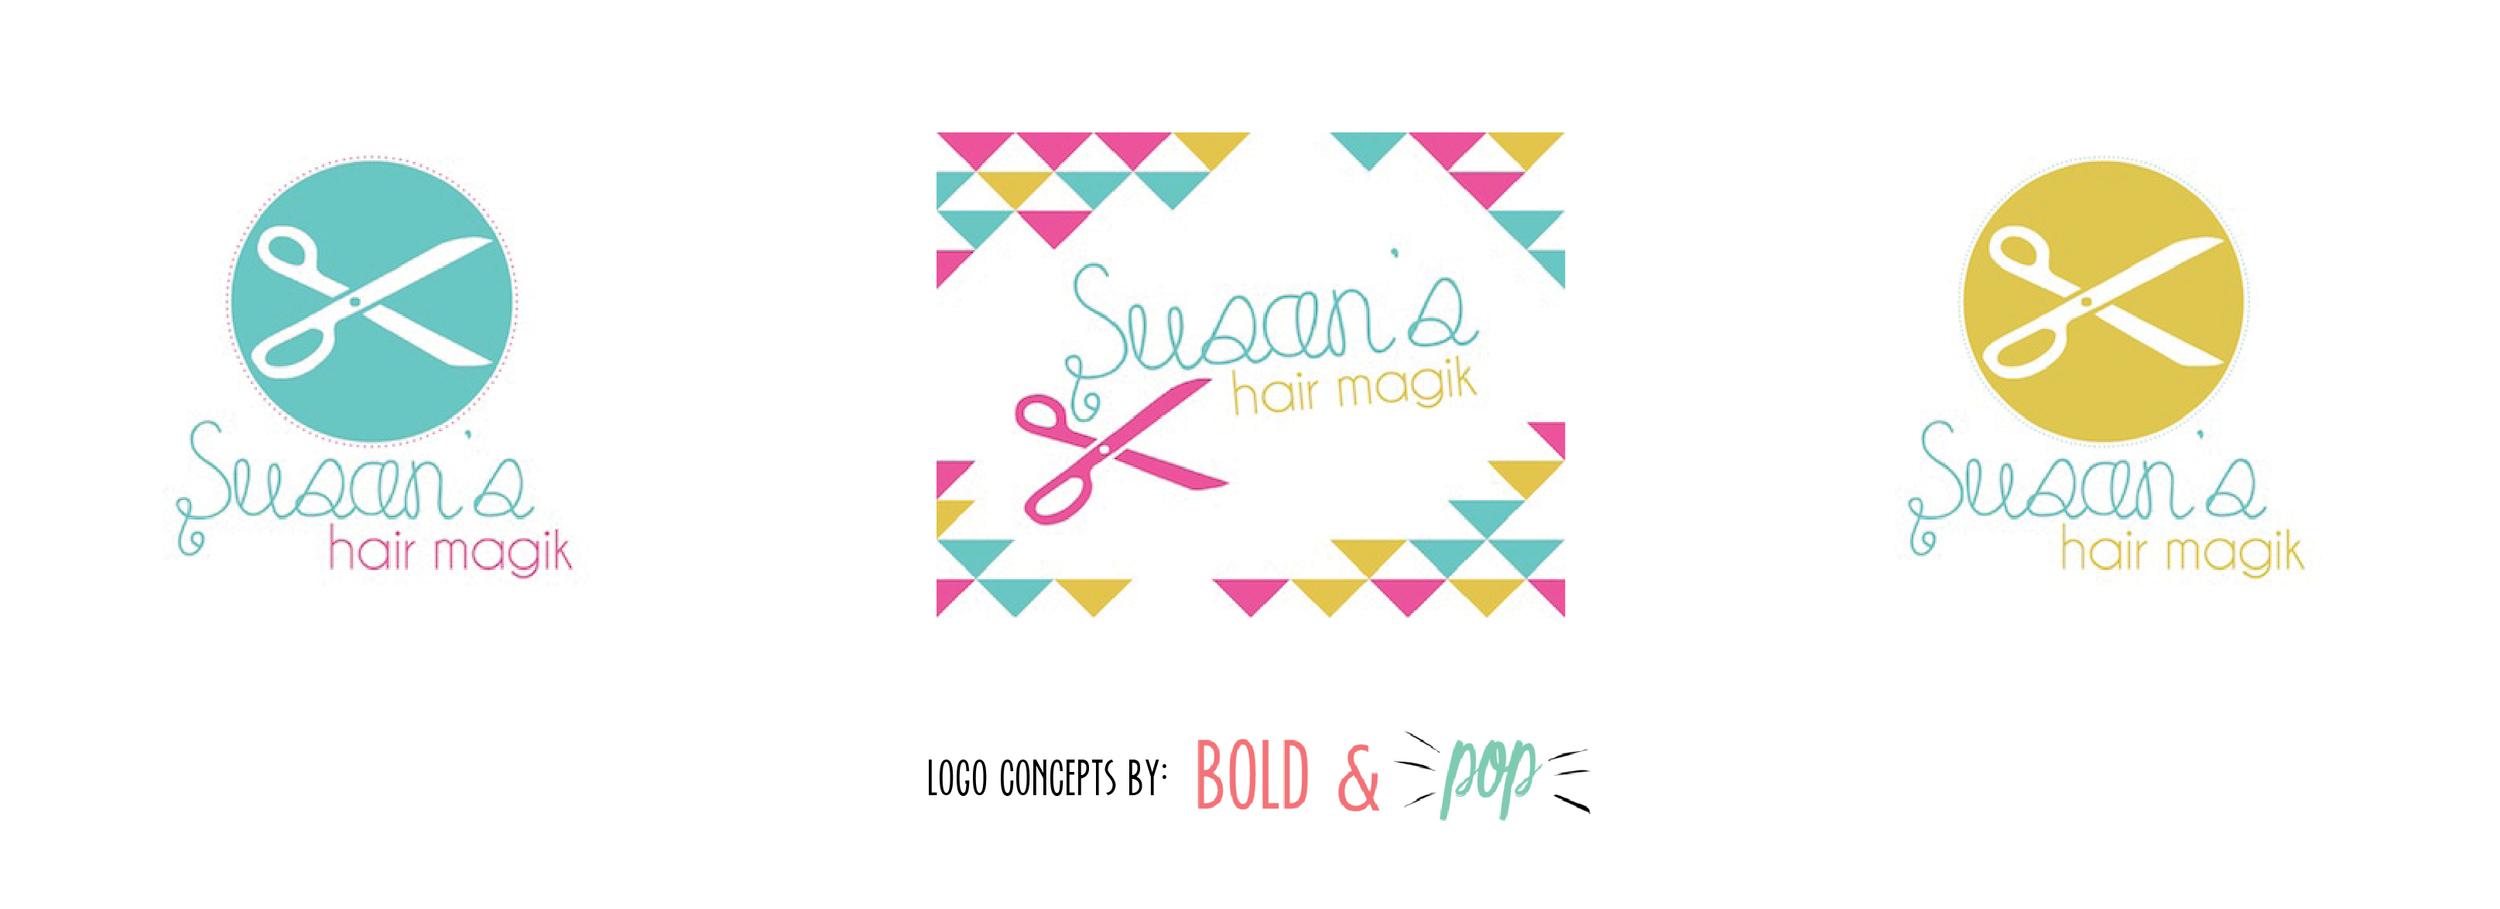 Bold & Pop : Susan's Hair Magik Branding Project